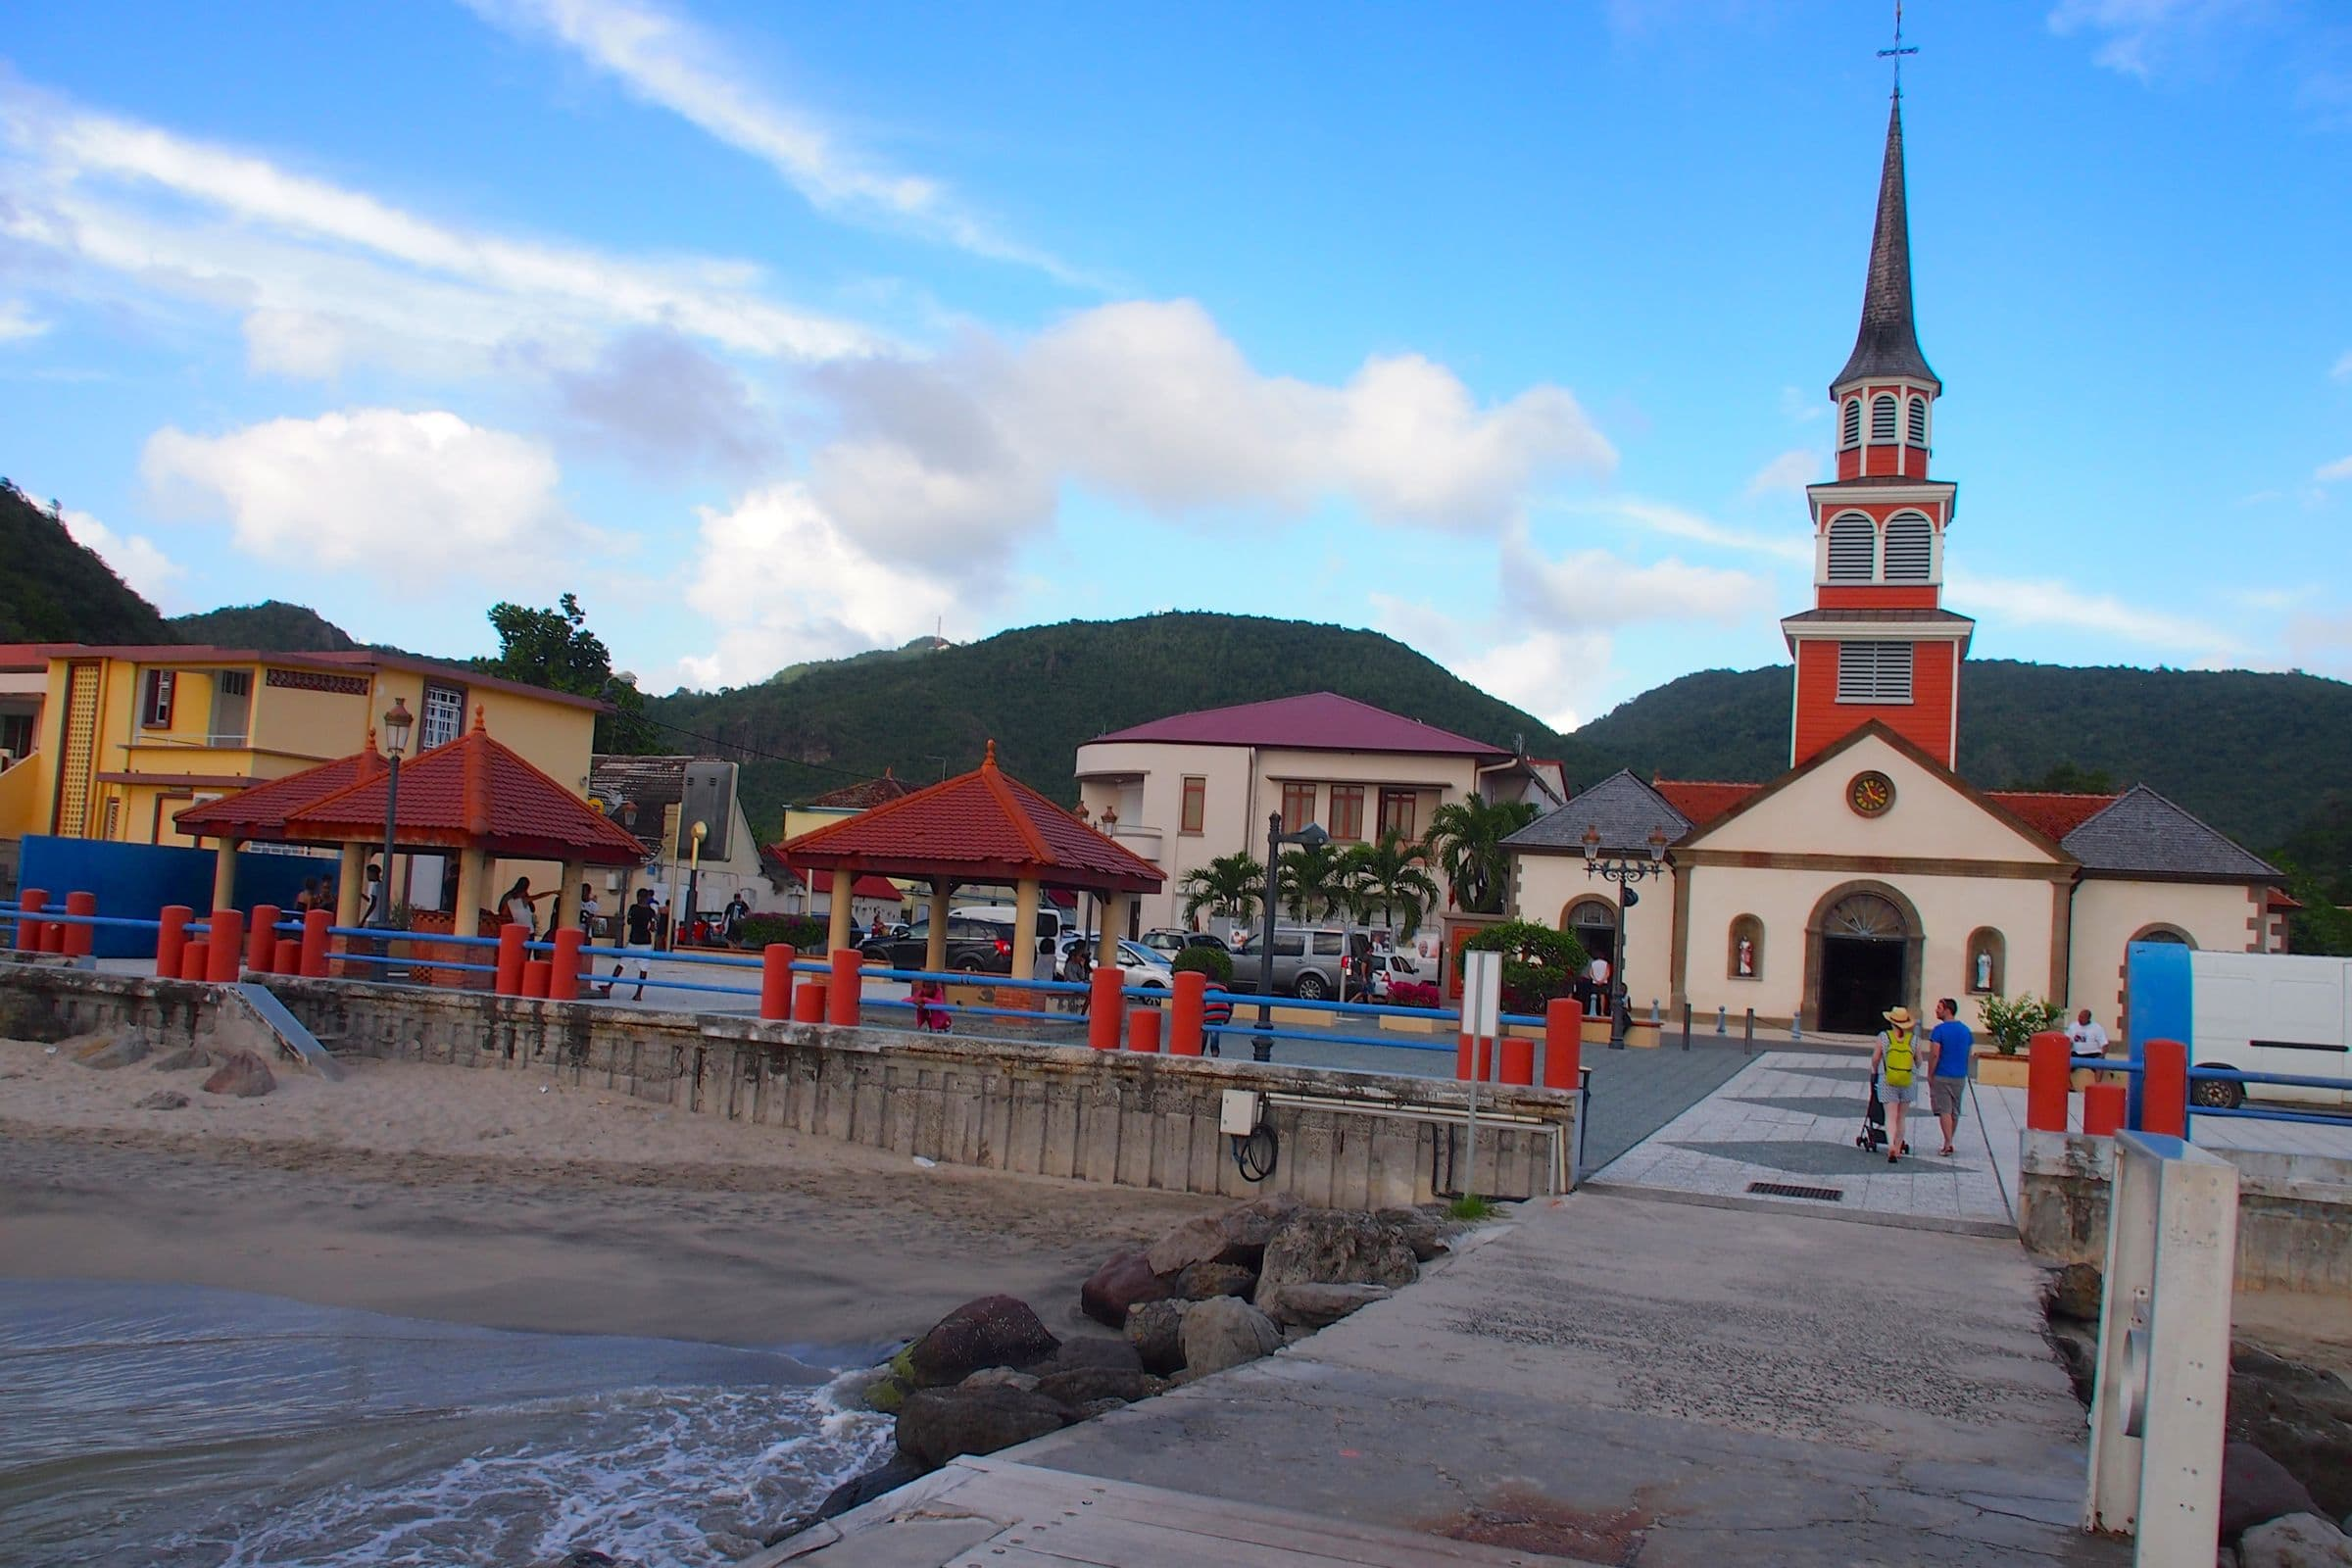 Revisiting Grande Anse D Arlet Martinique Martinique